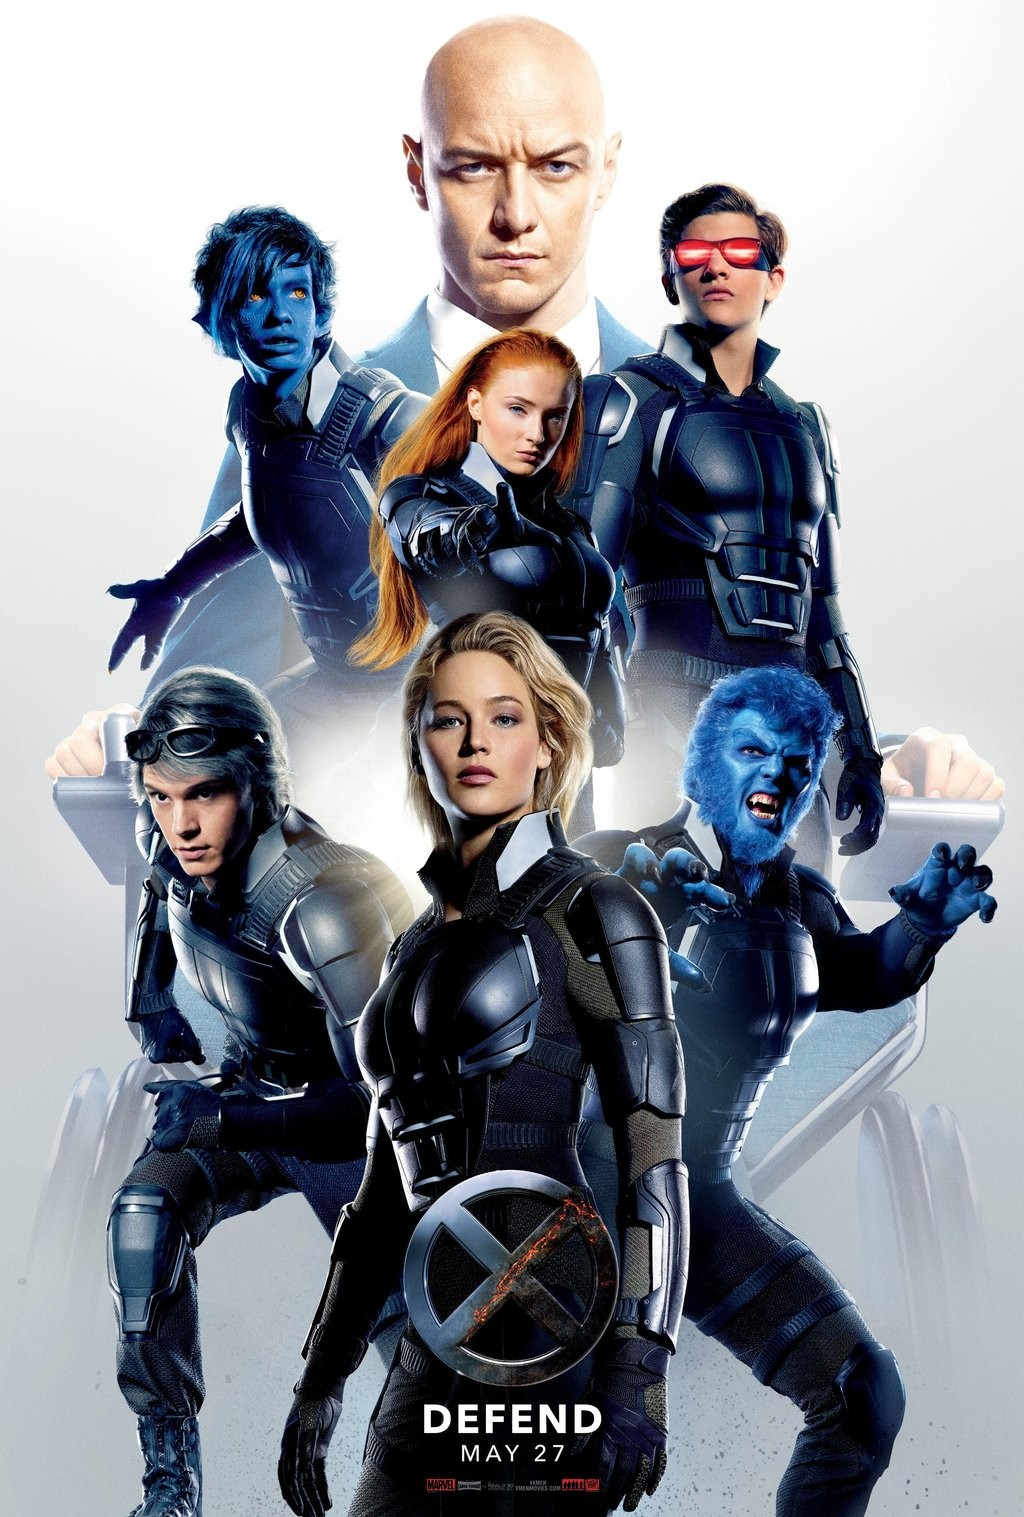 [DVD/BluRay] X-Men Apocalipsis - Página 2 1366_2000